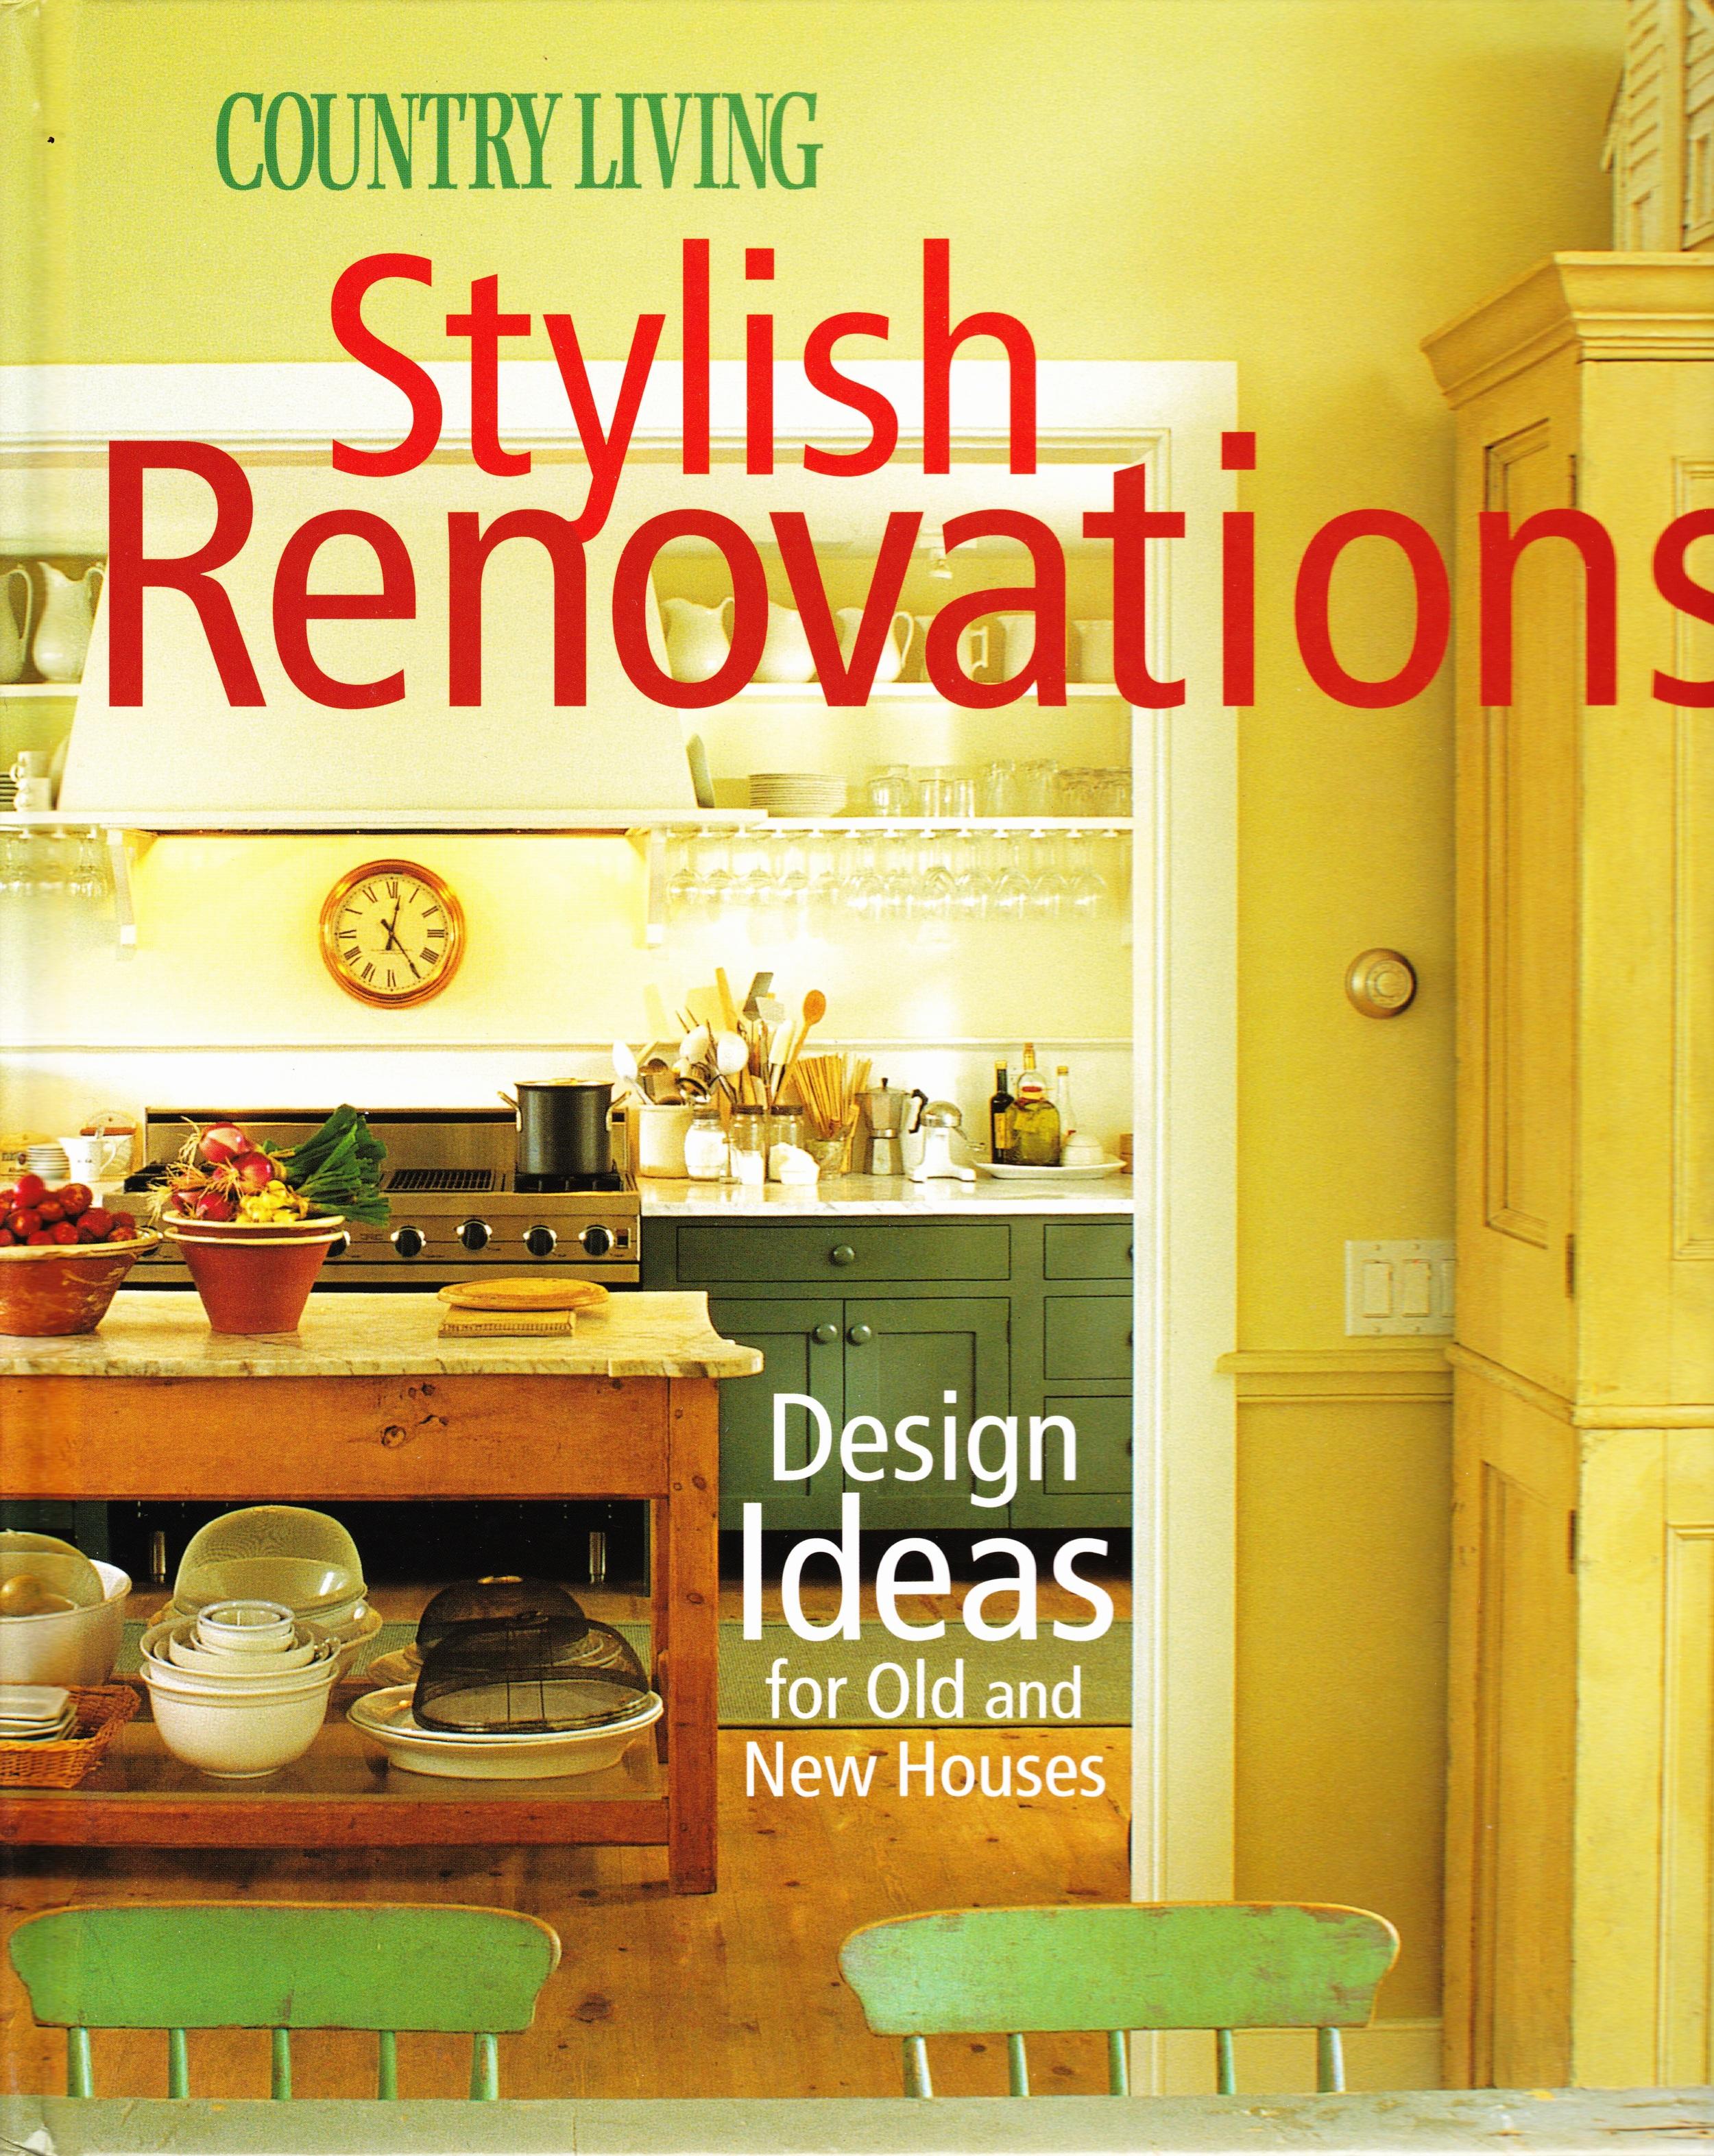 CL Sytlish Renovations_0001.jpg